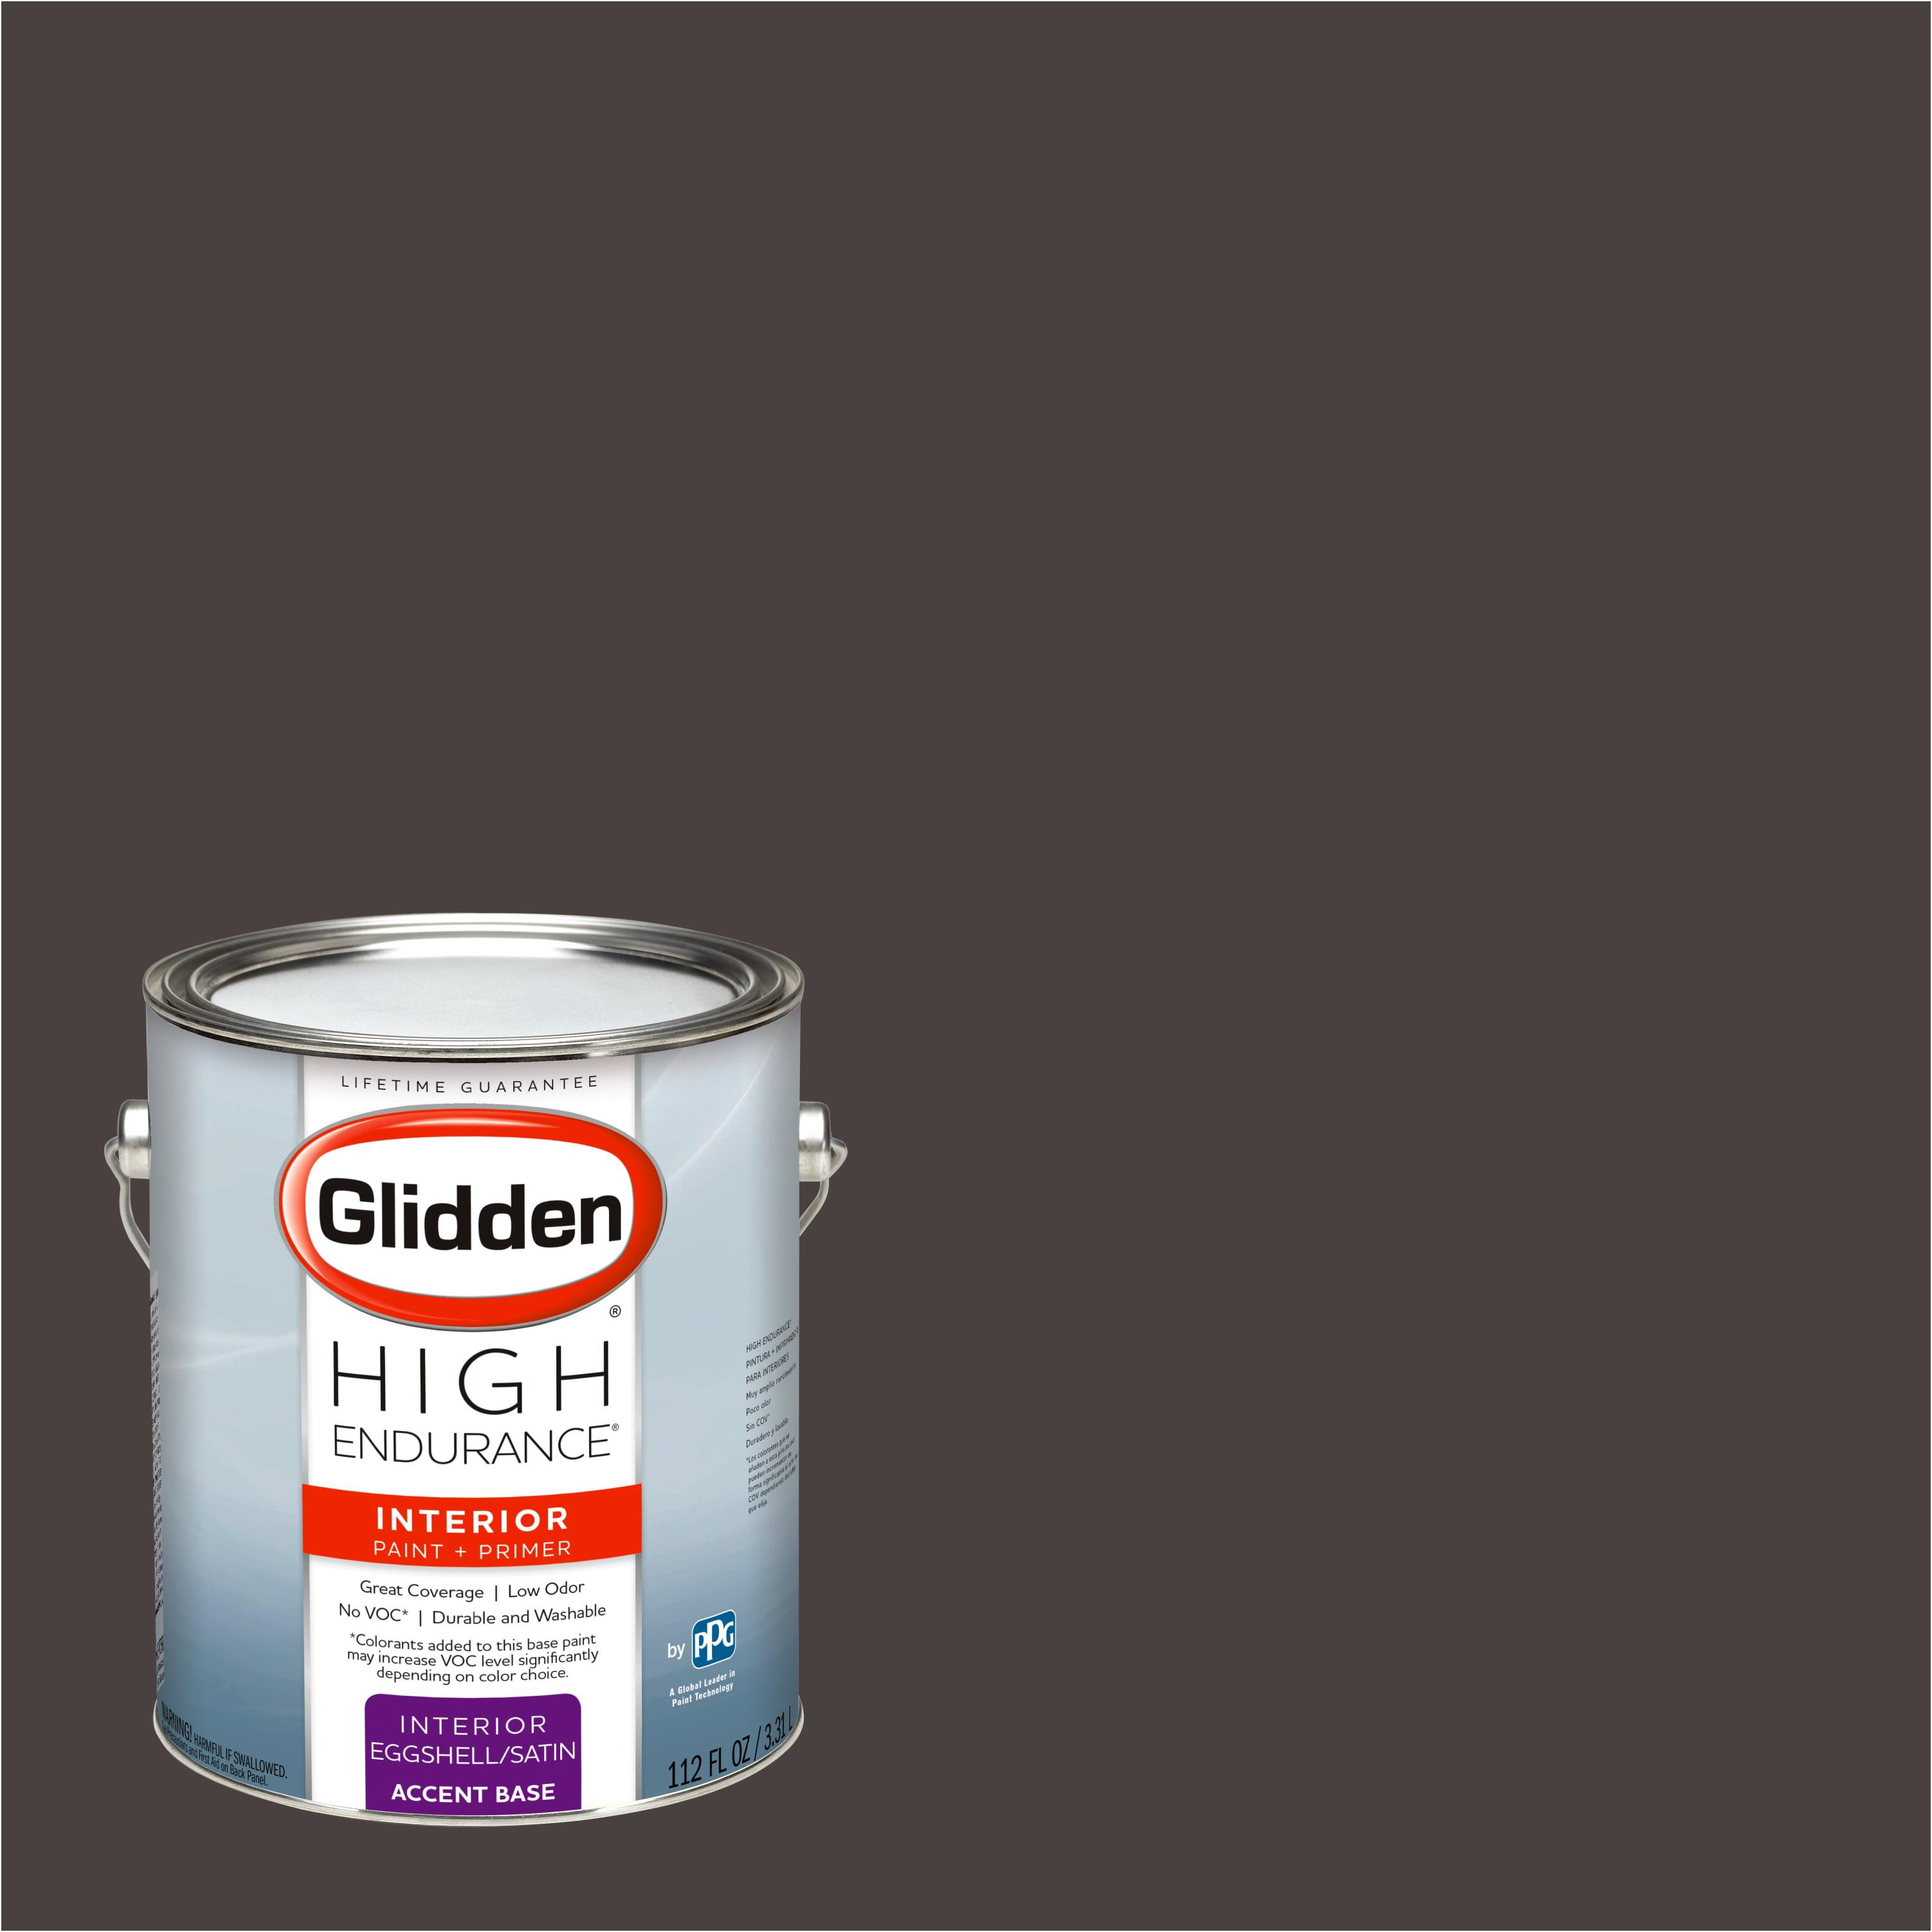 Glidden High Endurance, Interior Paint and Primer, Western Charcoal, #50YR 06/041